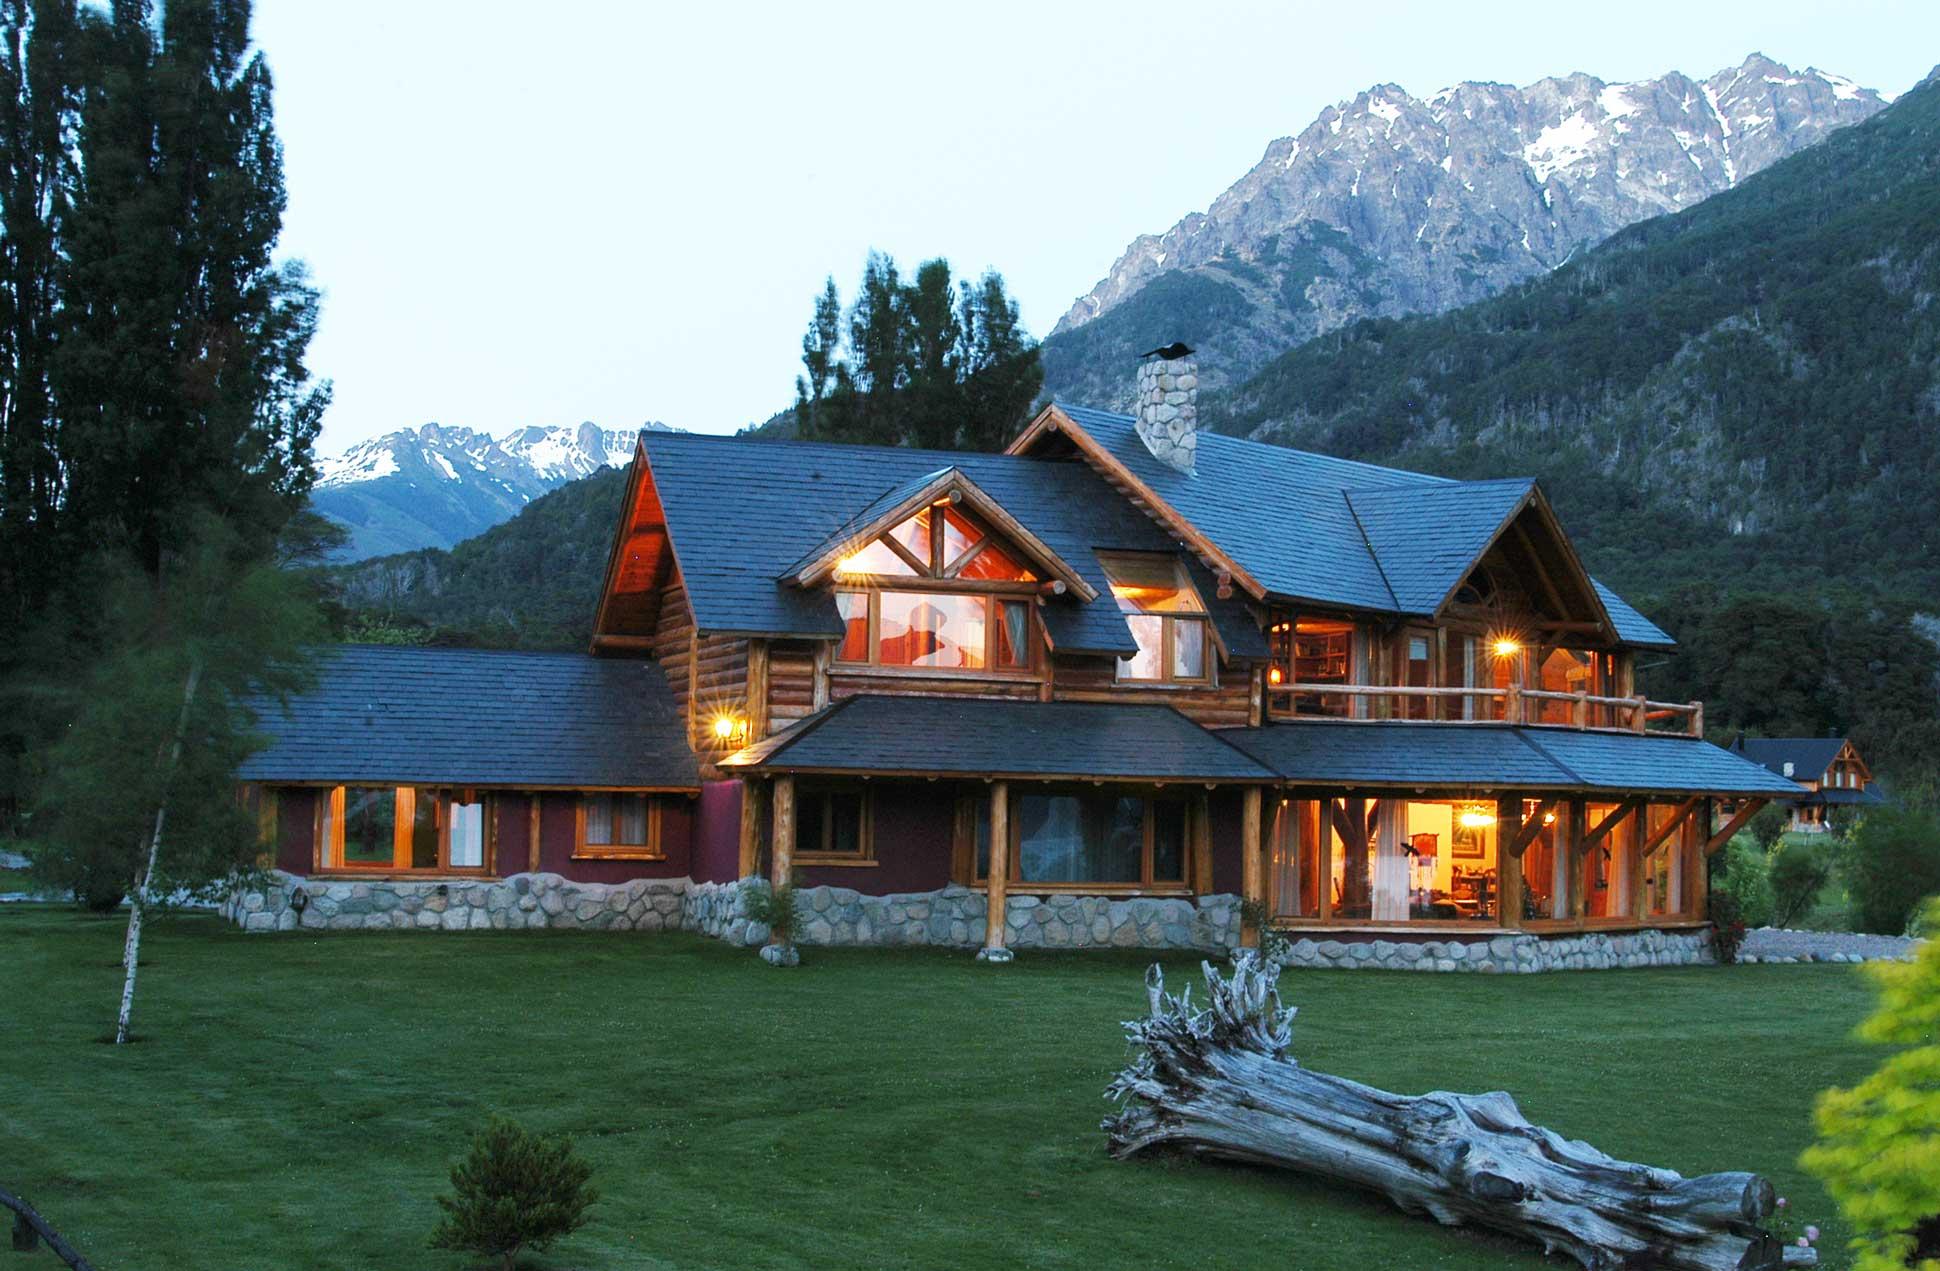 Peuma Hue in Bariloche, Argentina